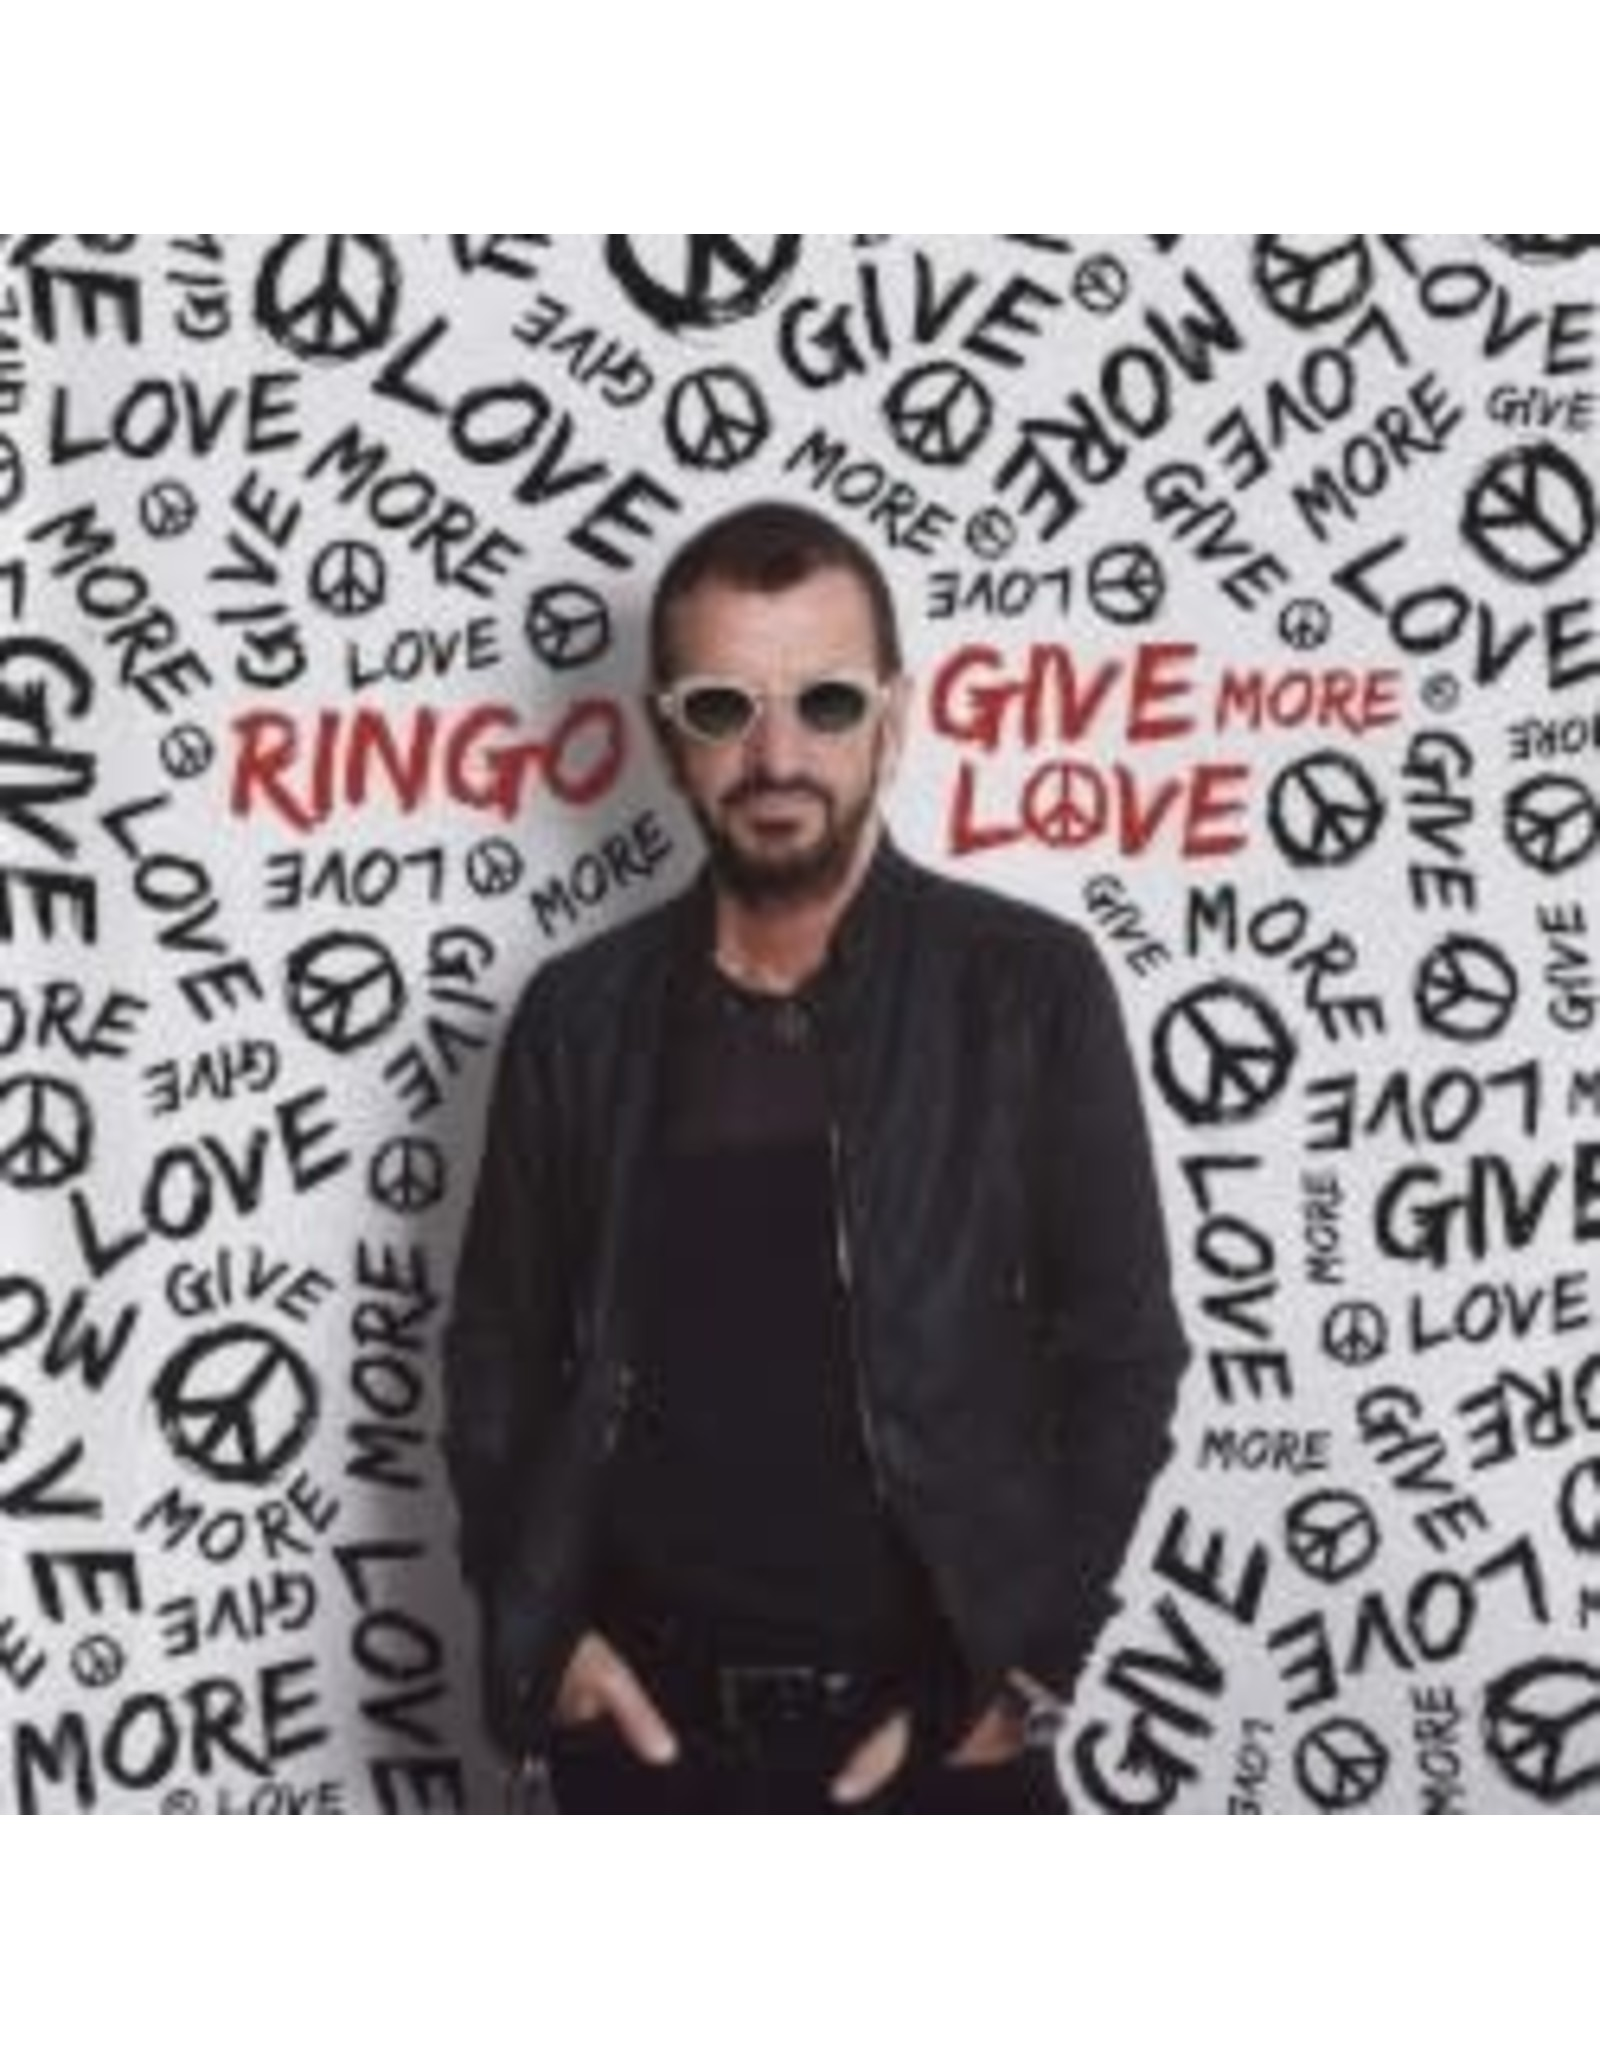 Starr, Ringo - Give More Love LP